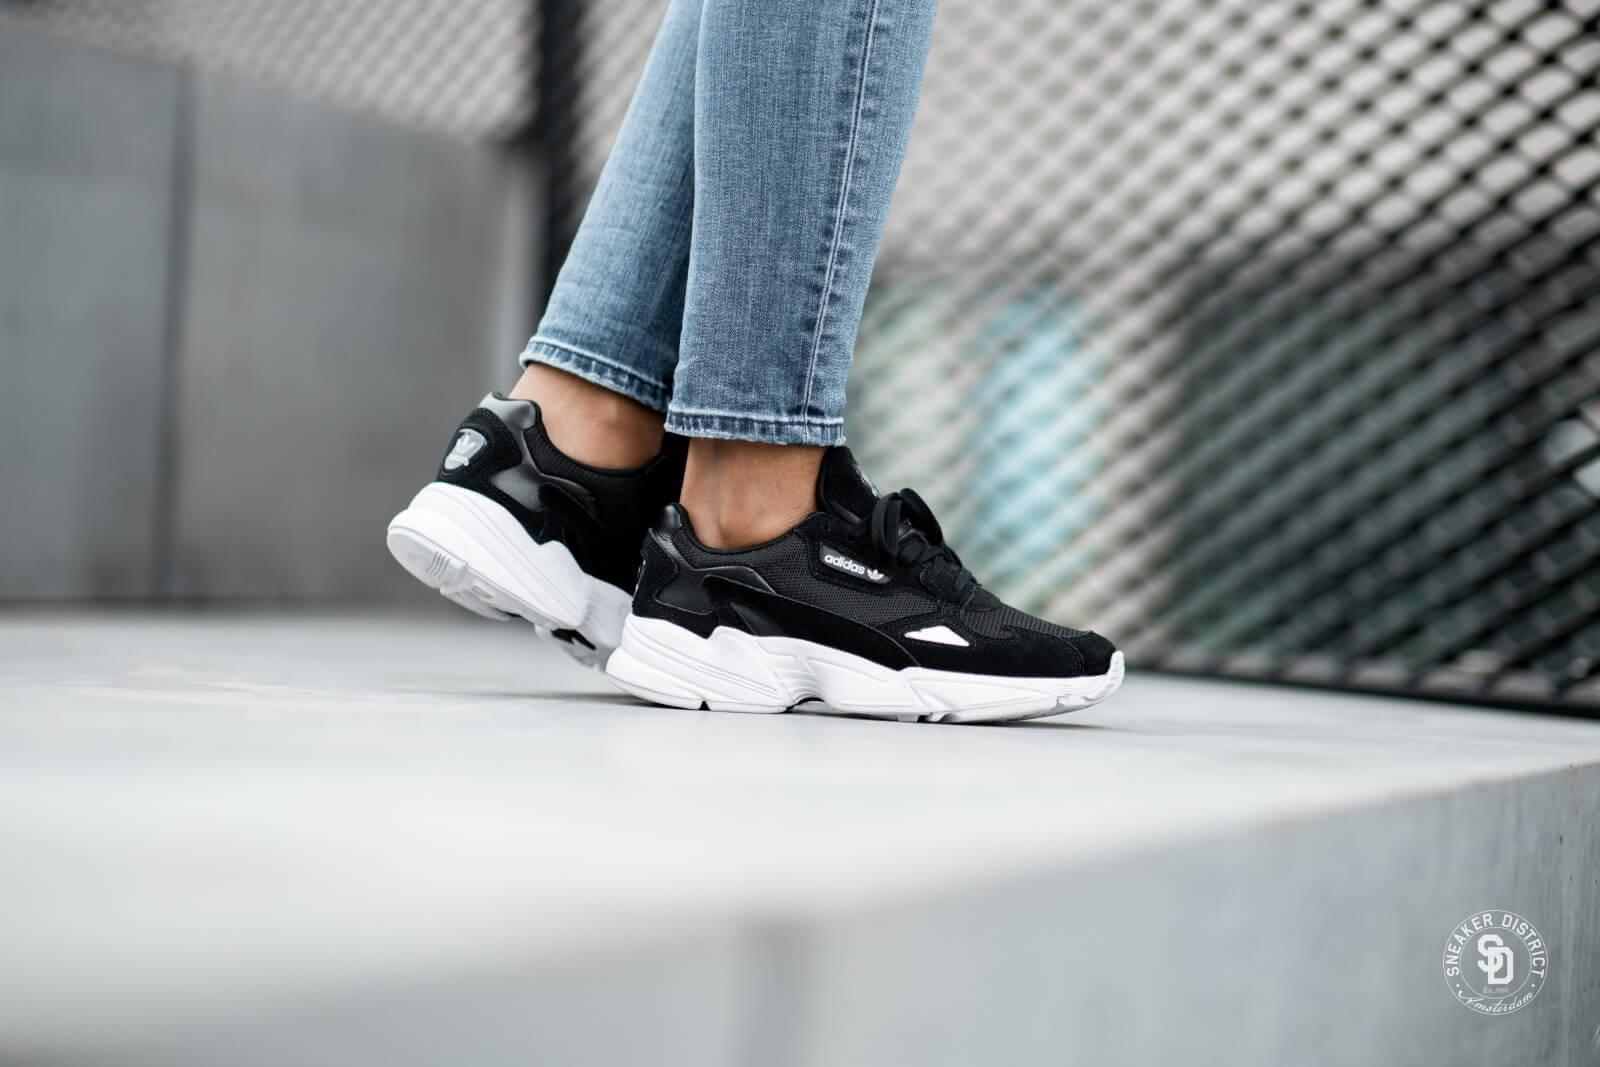 Adidas Women's Falcon Black/White - B28129